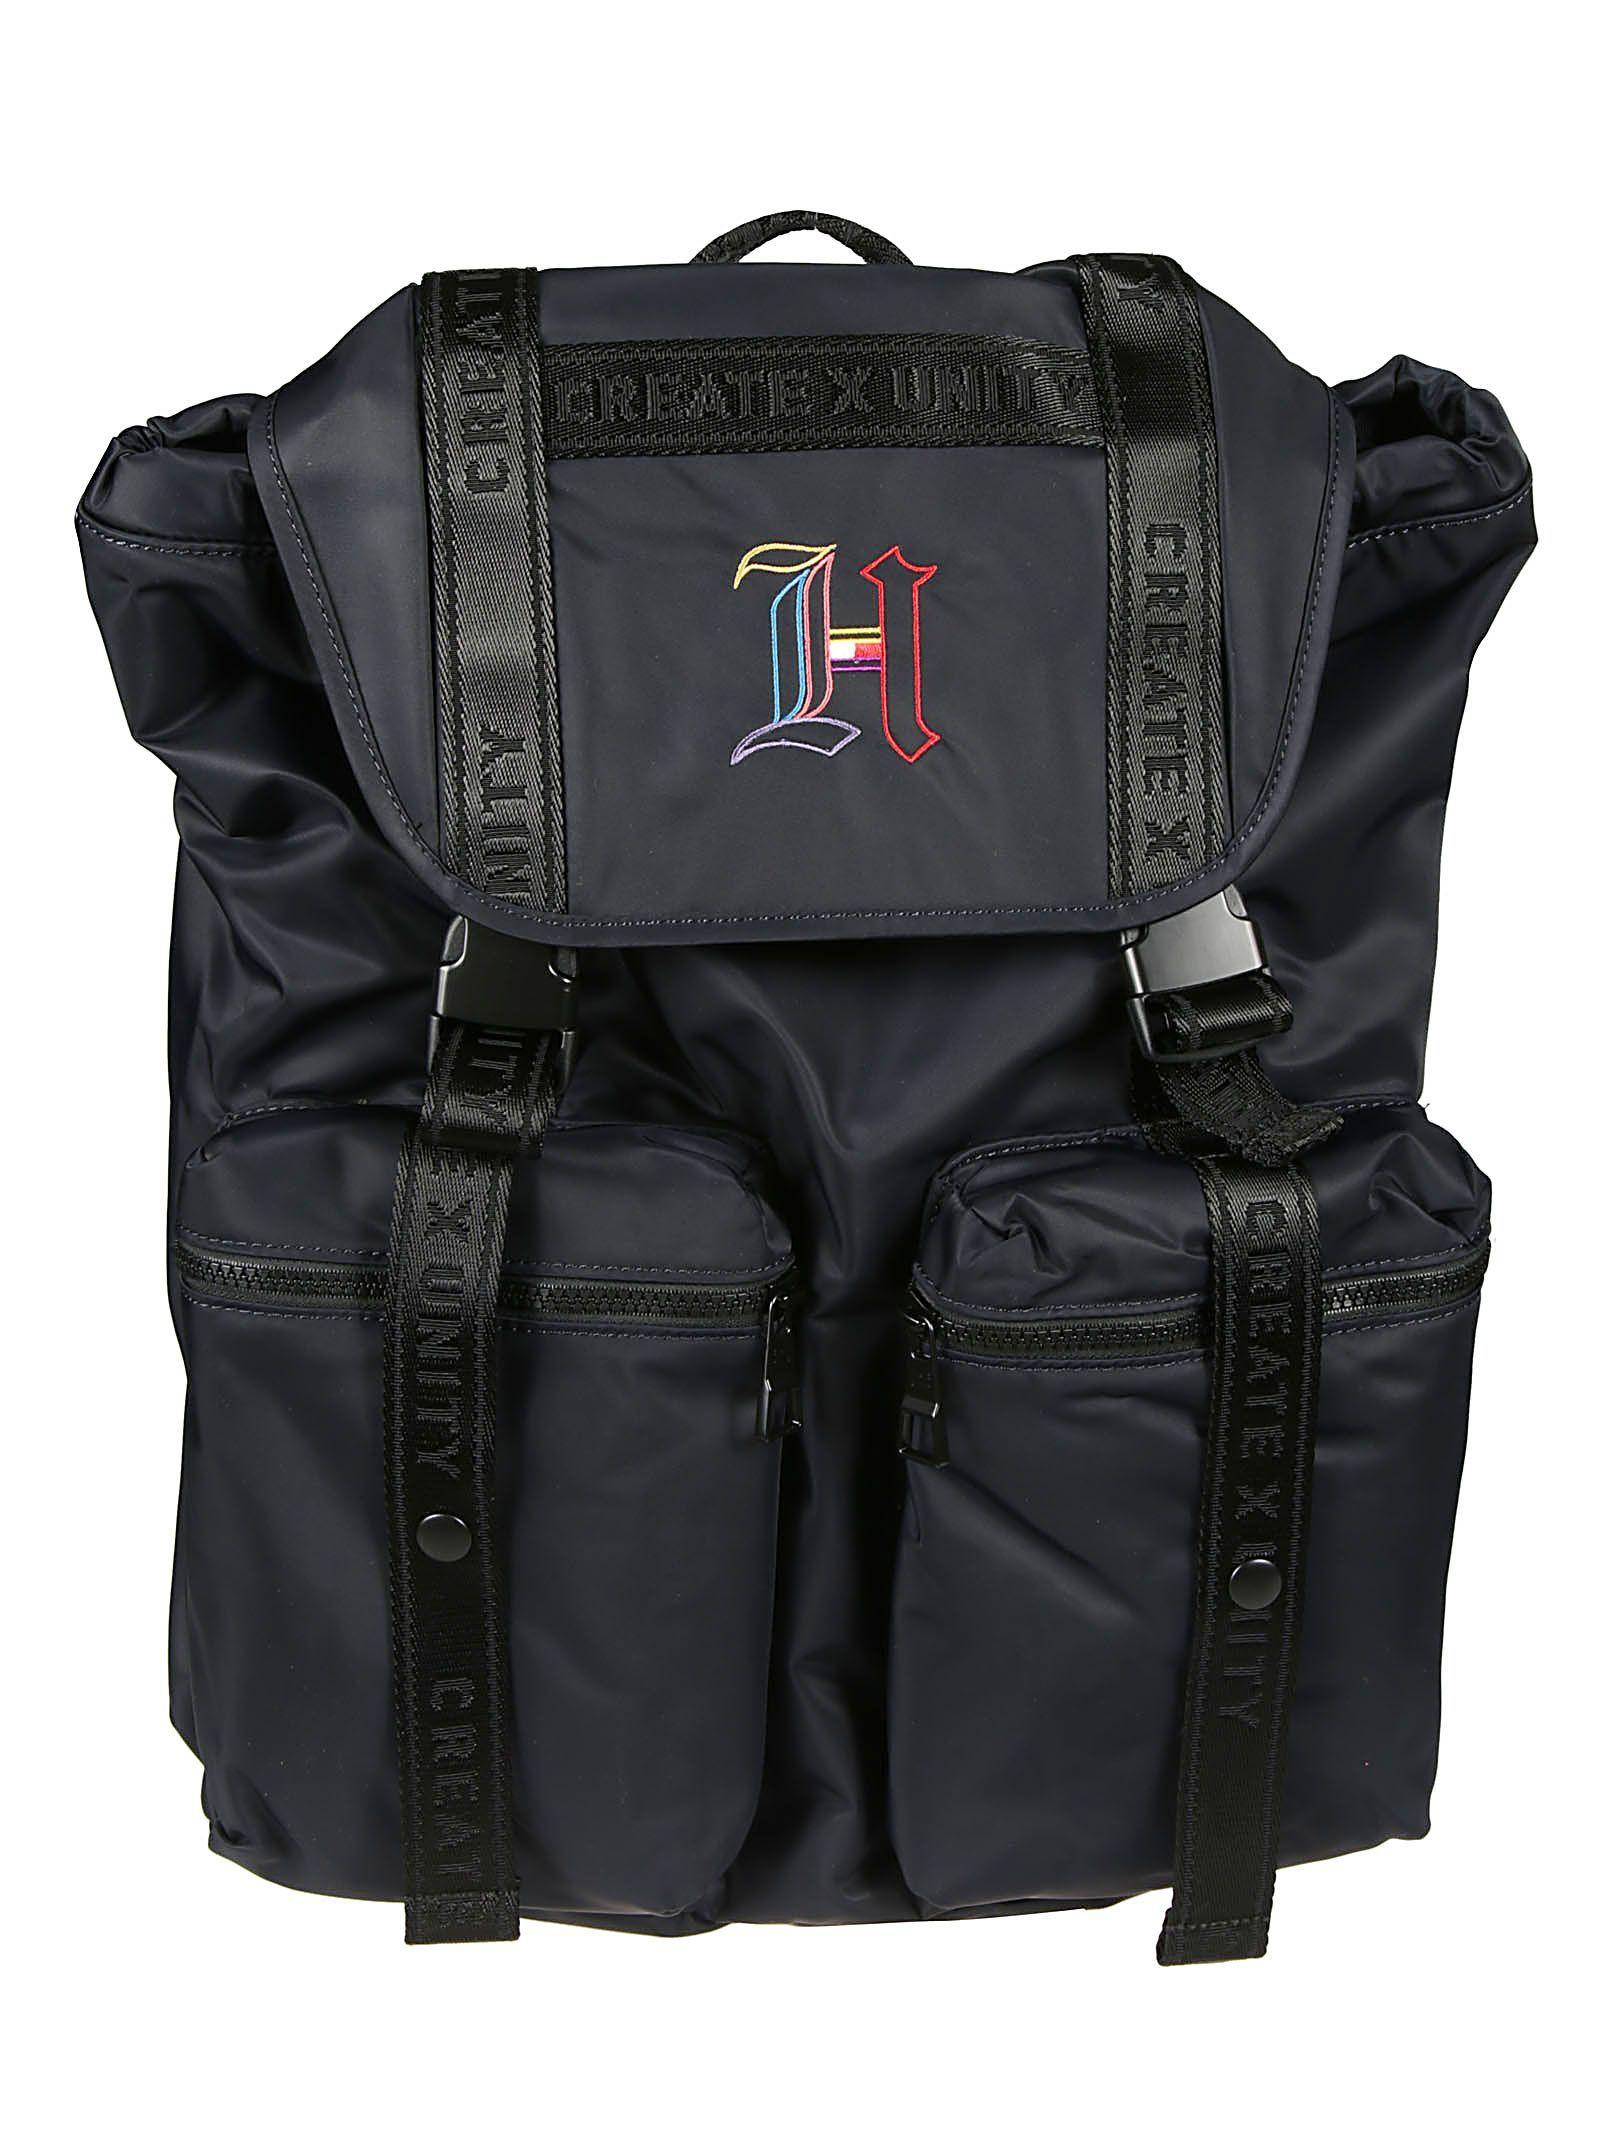 2ac5a416 TOMMY HILFIGER LEWIS HAMILTON MONOGRAM FLAP BACKPACK. #tommyhilfiger #bags # backpacks